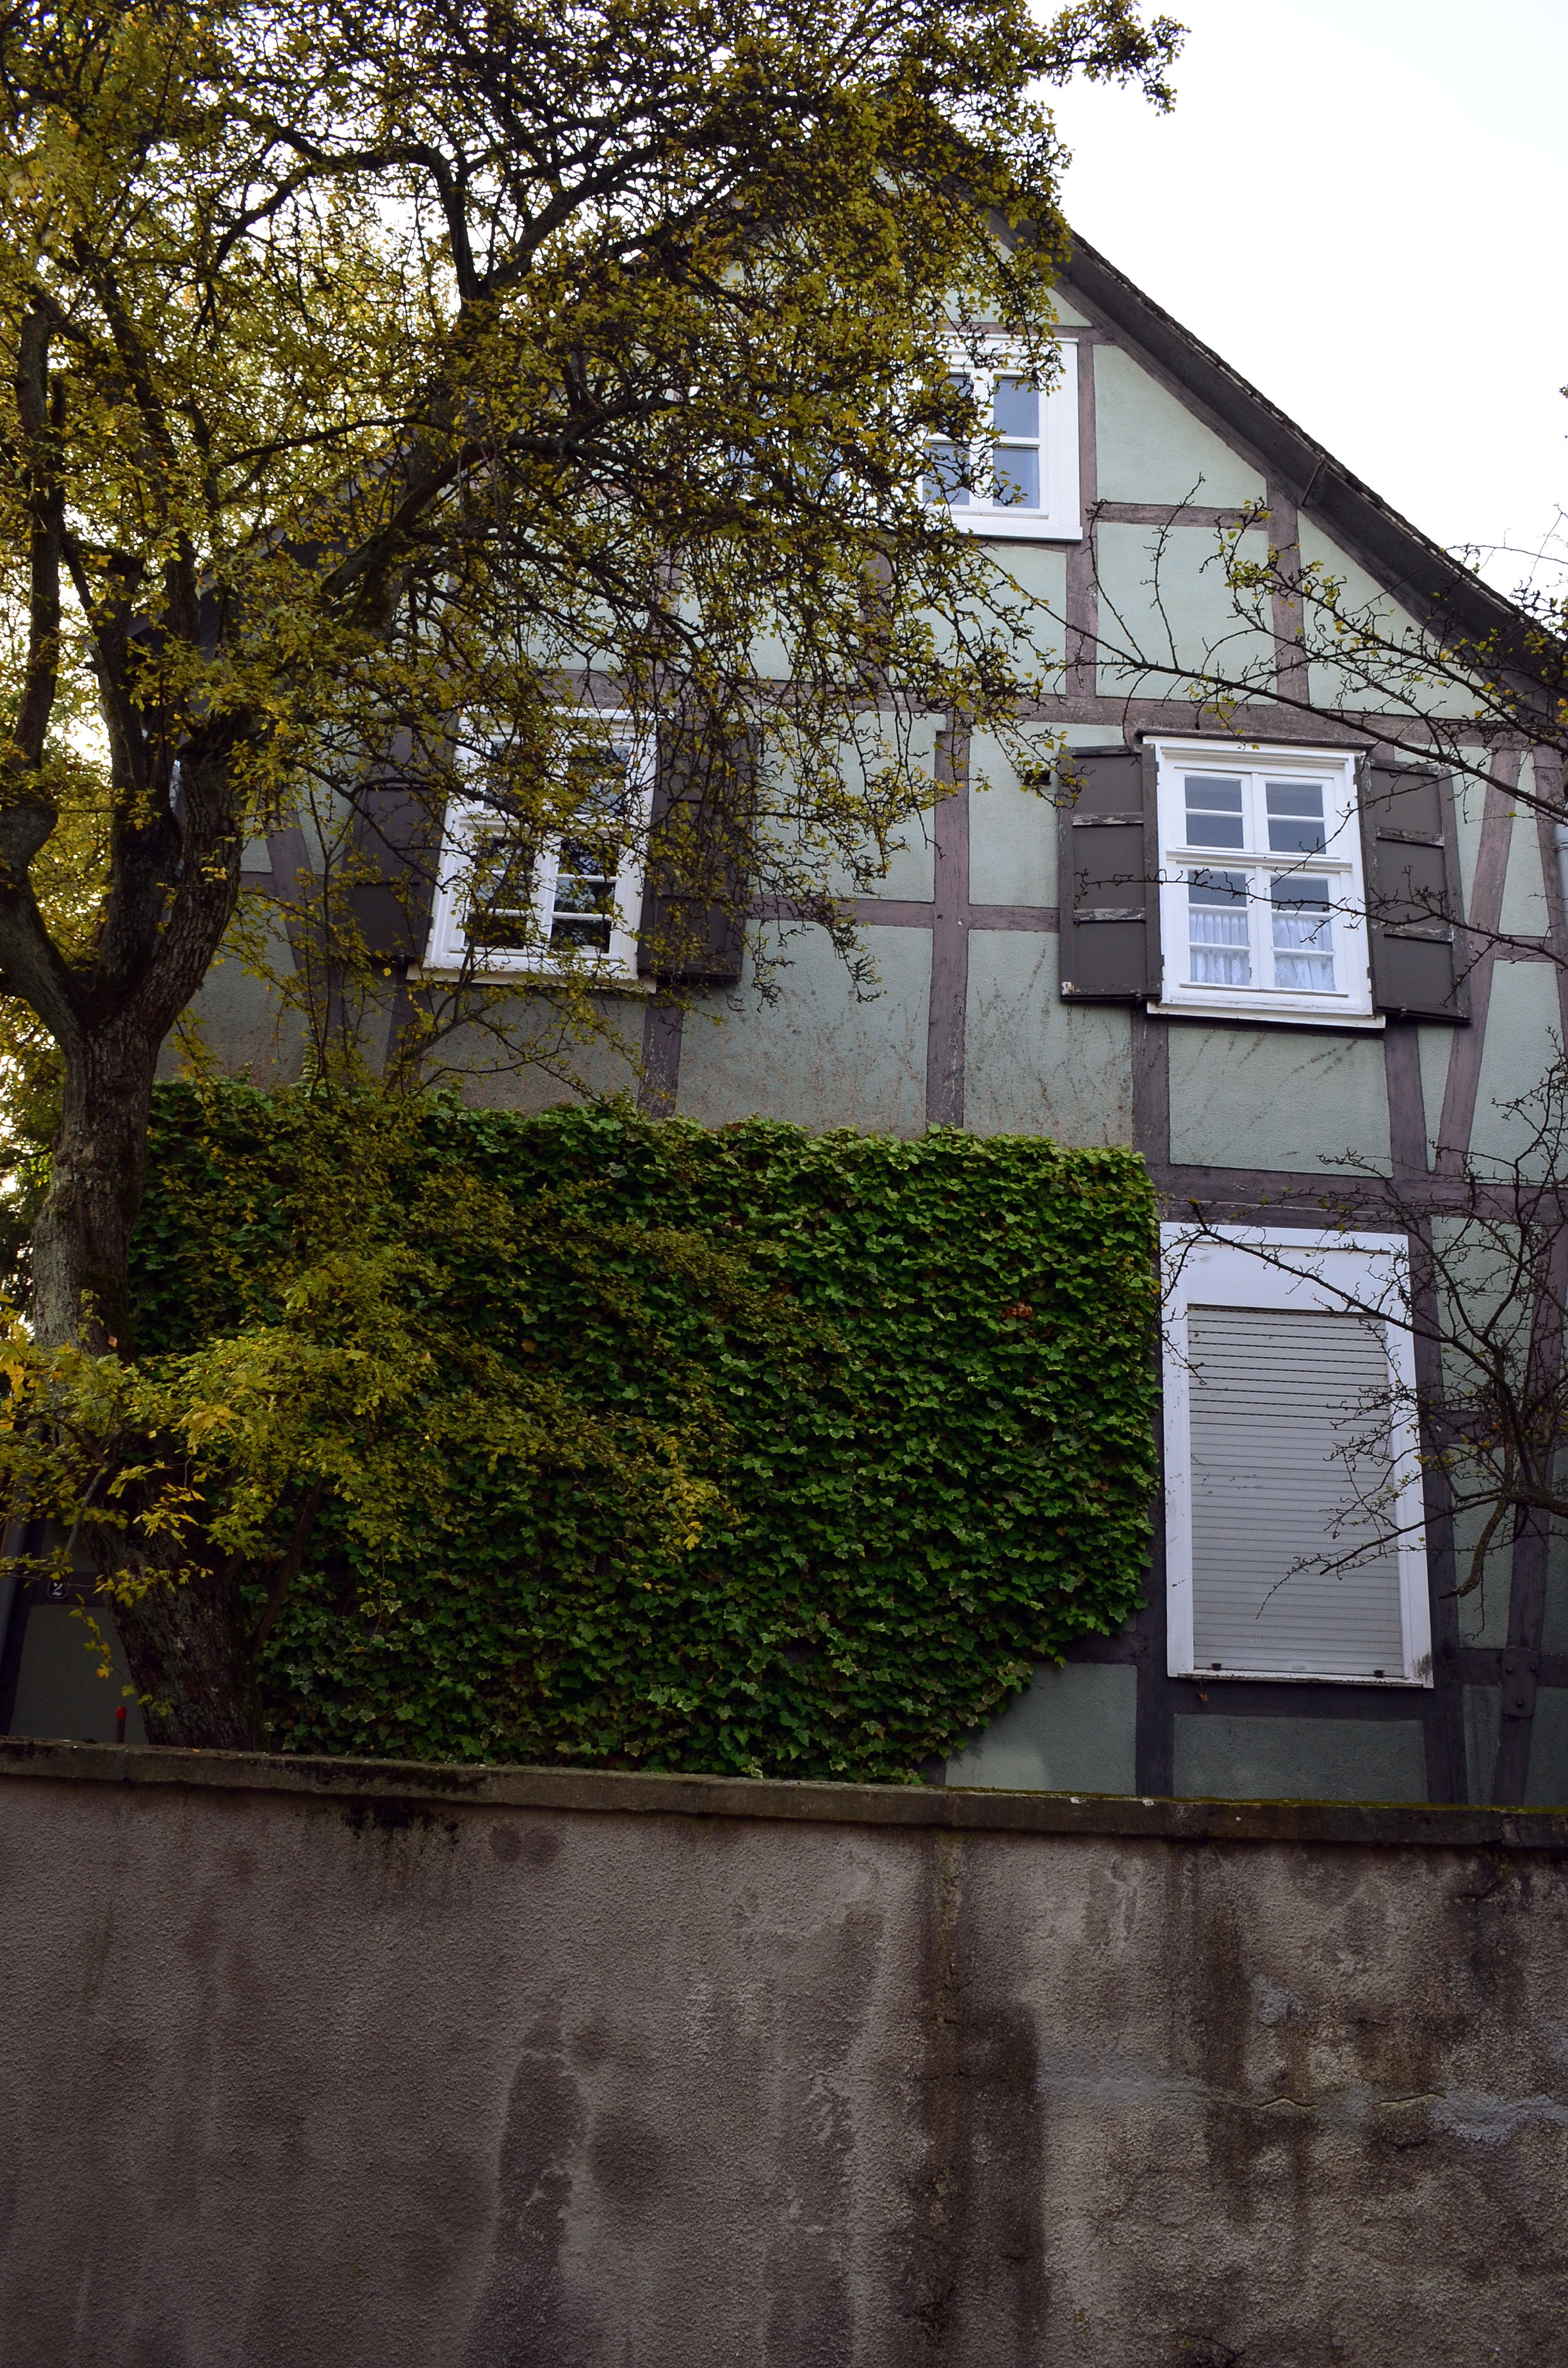 File:Brilon-Querstraße 2-Giebelseite-2012-10-19-B.jpg - Wikimedia ...